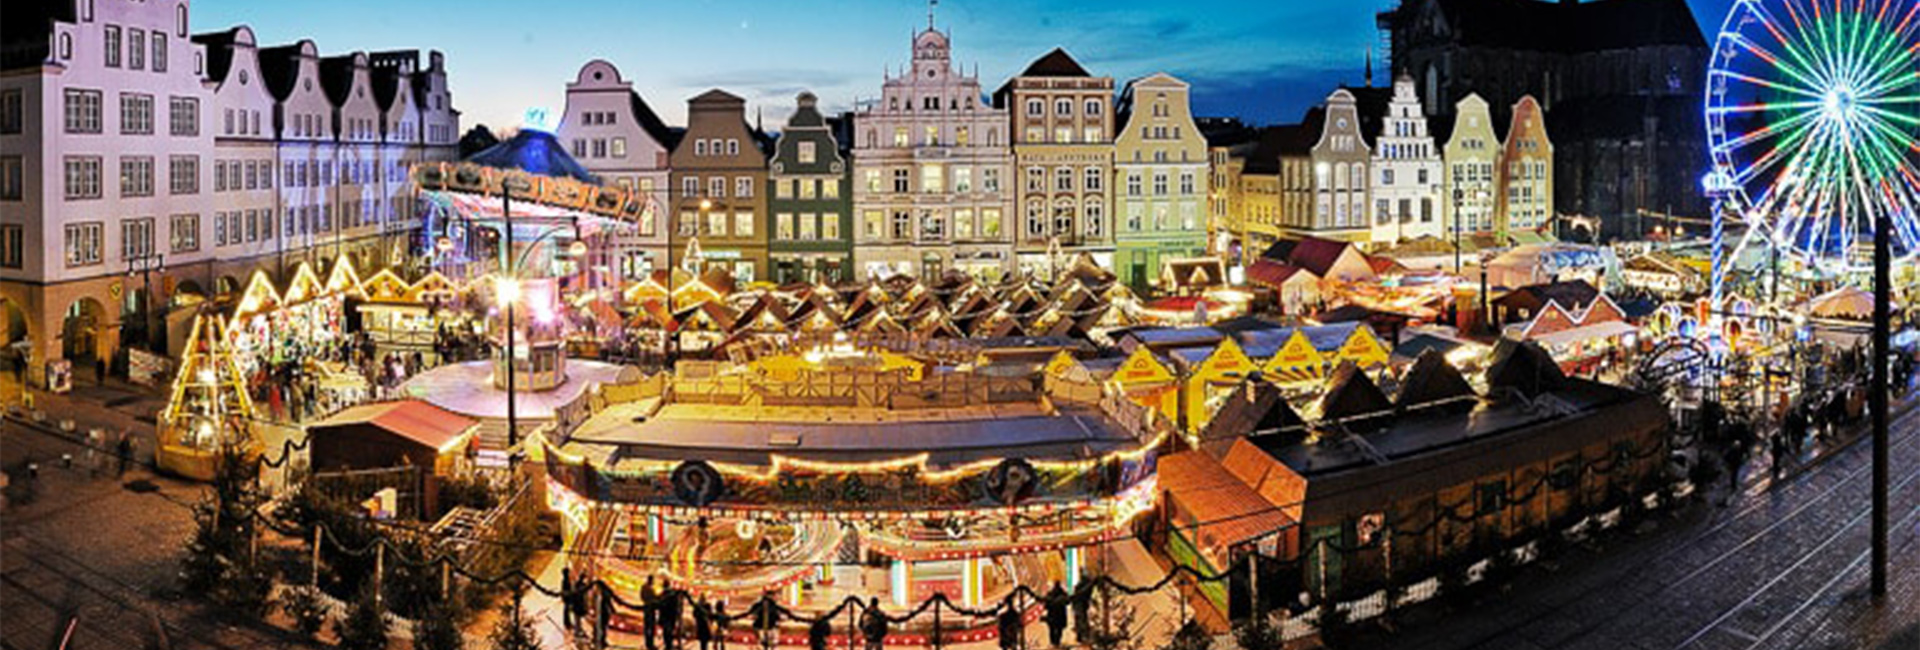 Rostock julemarked